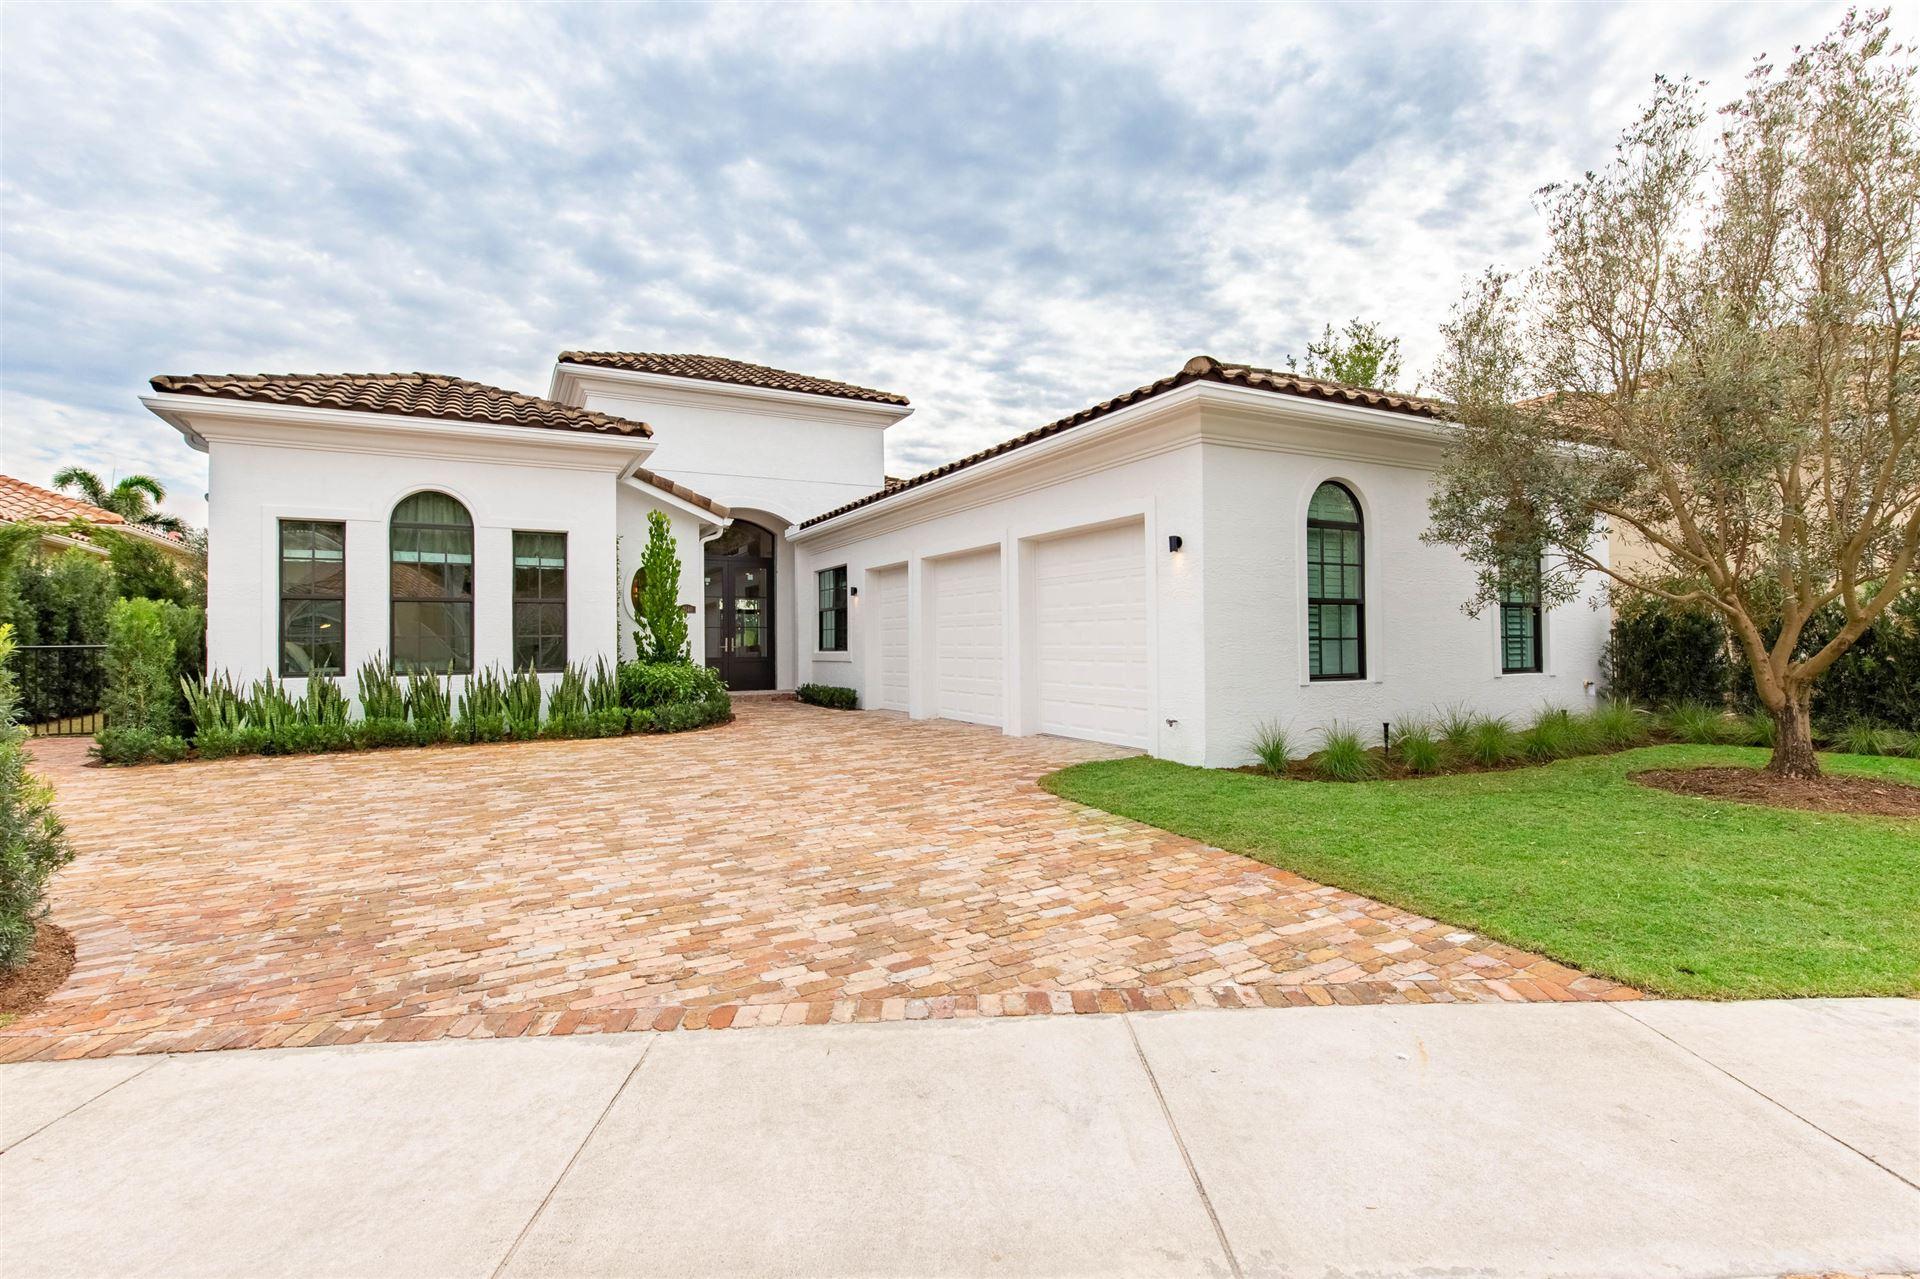 12140 Sunnydale Drive, Wellington, FL 33414 - MLS#: RX-10688967